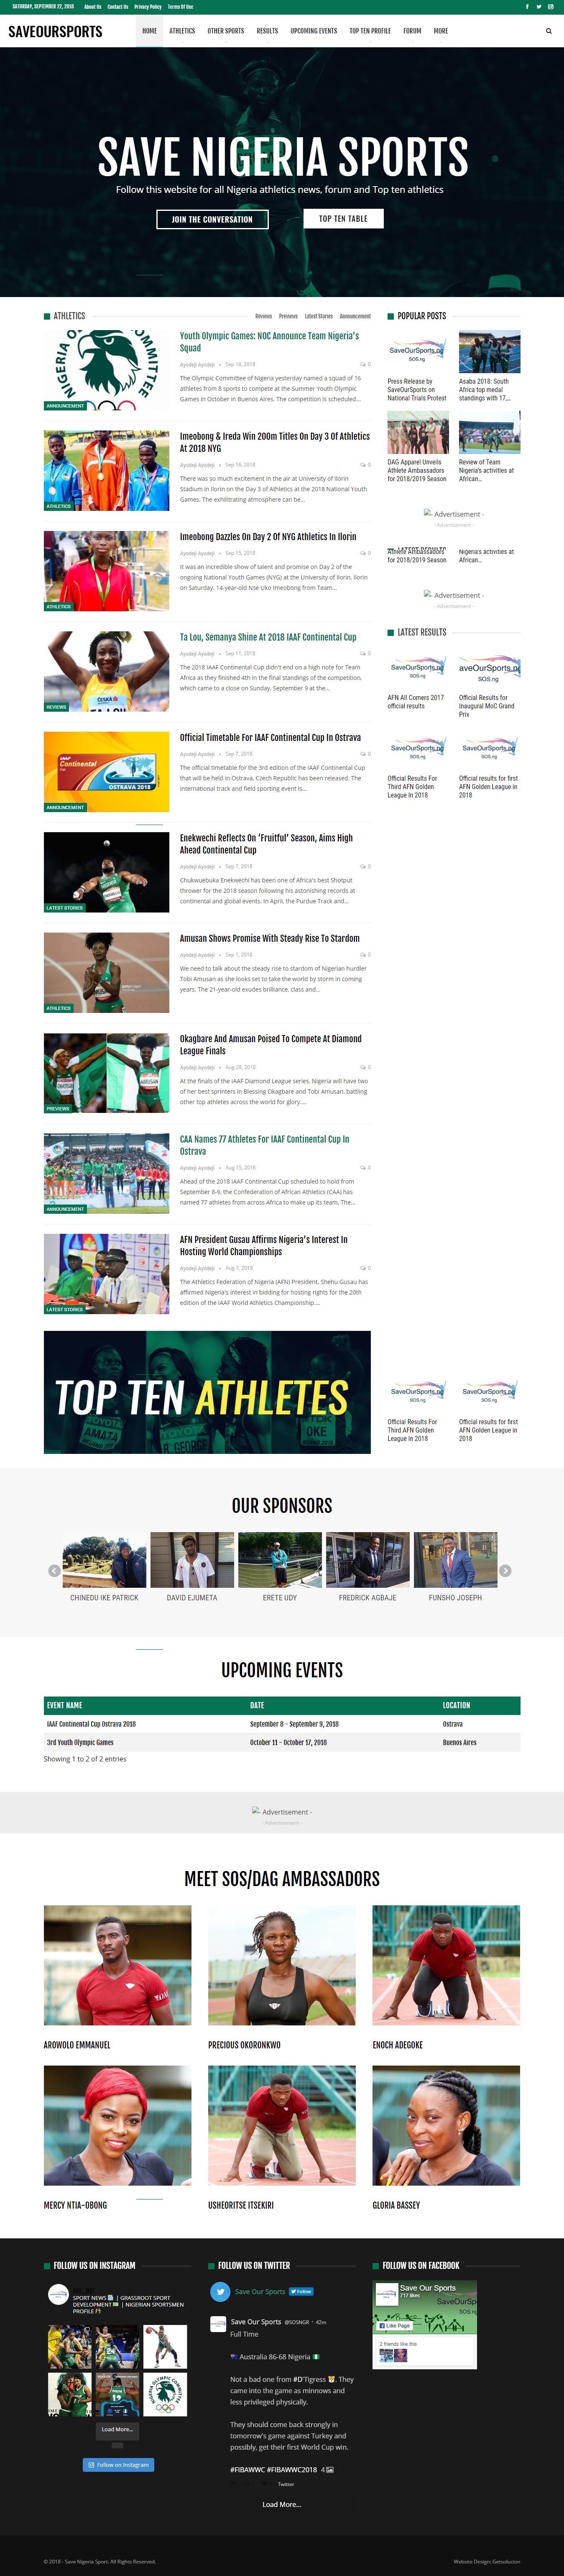 Save Our Sports Nigeria Website Design